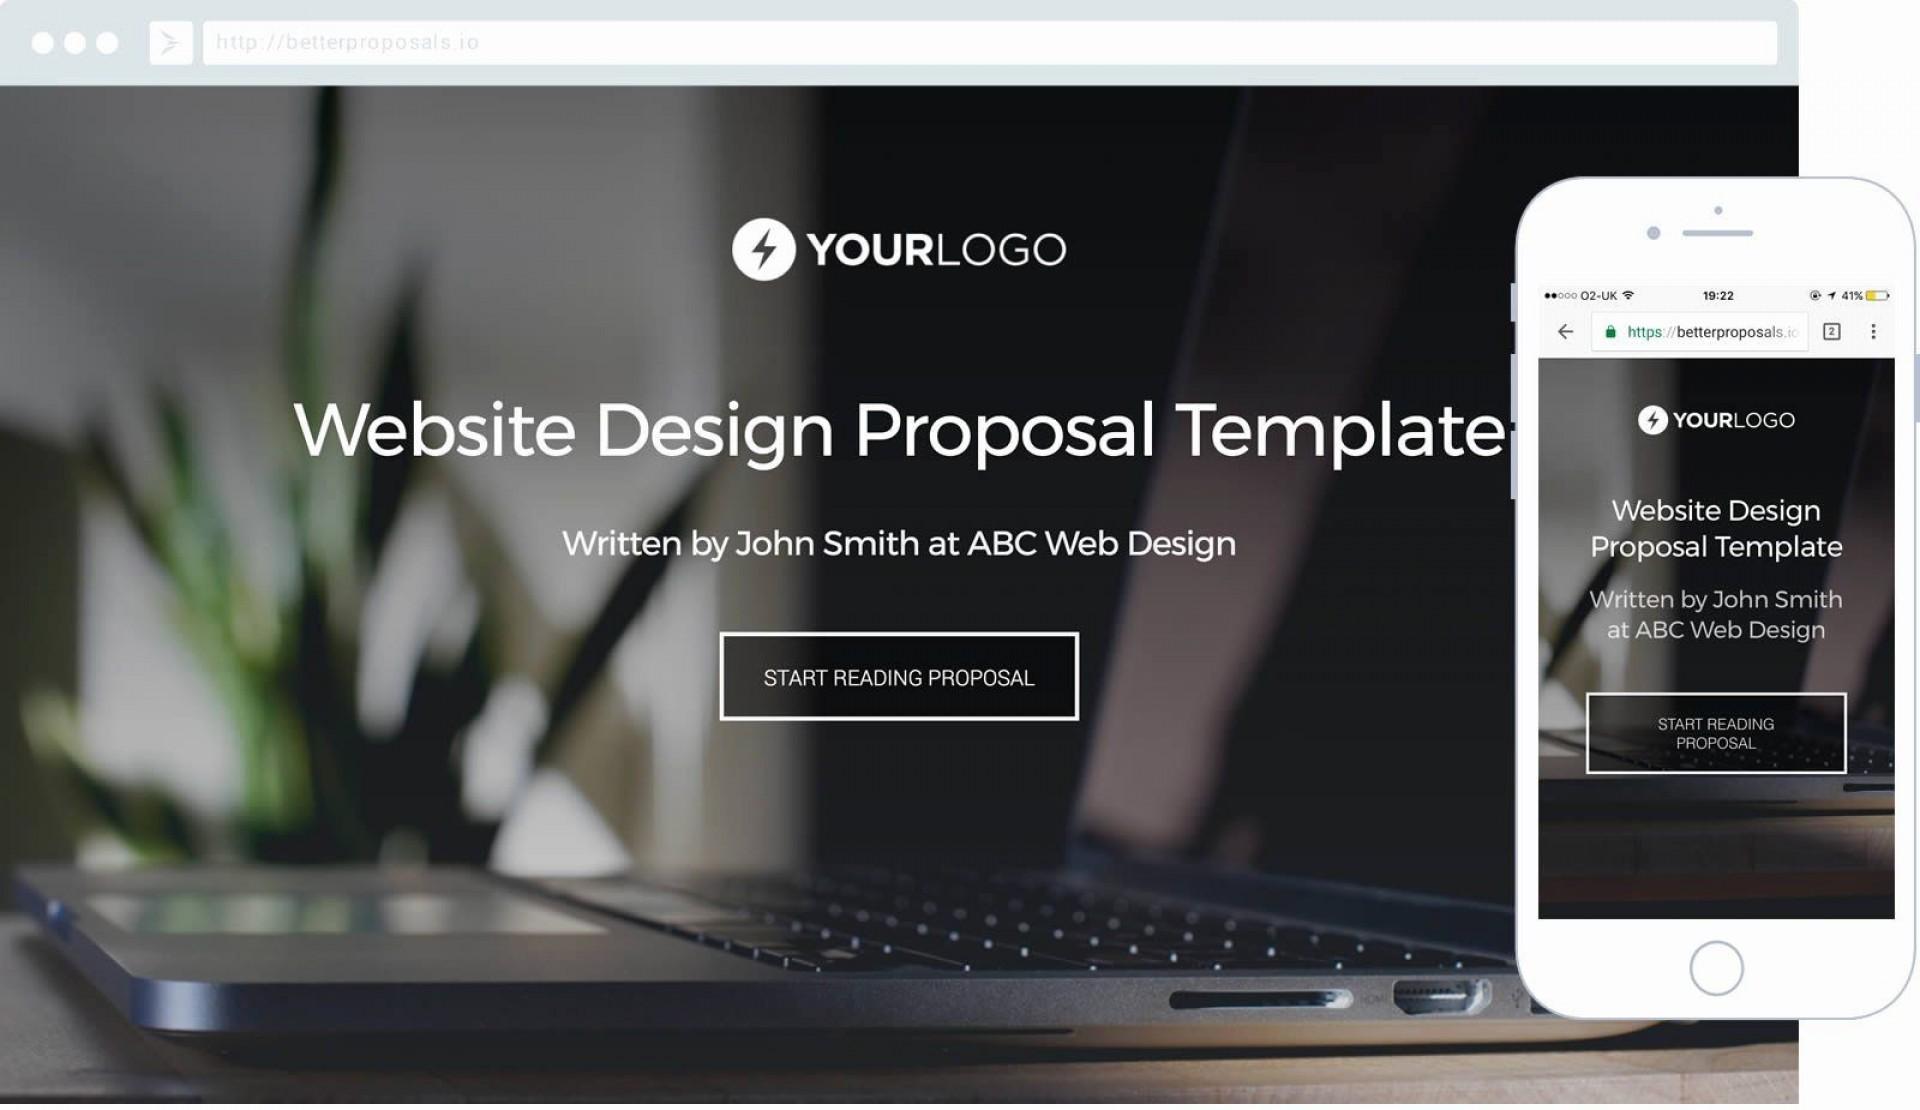 004 Stunning Web Design Proposal Template Free High Definition  Freelance Download1920